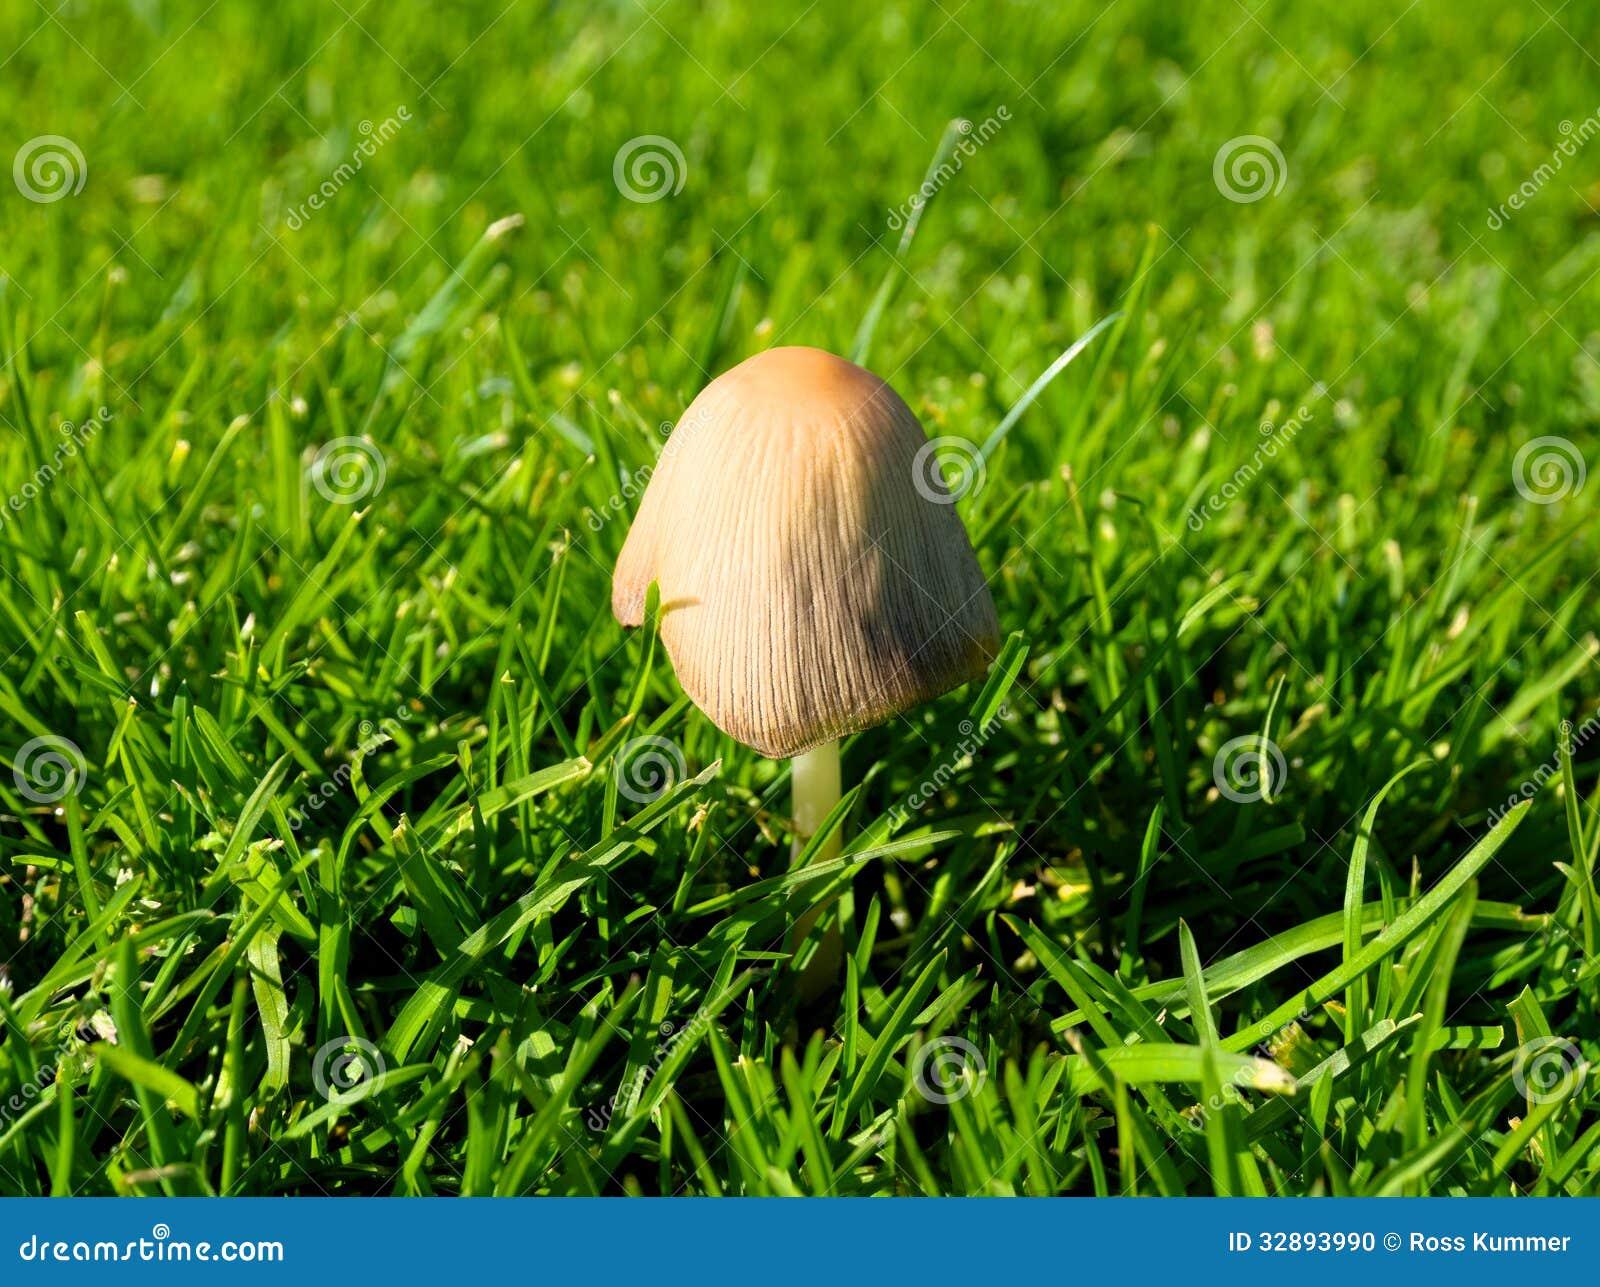 recipe: svampar i gräsmattan bilder [24]